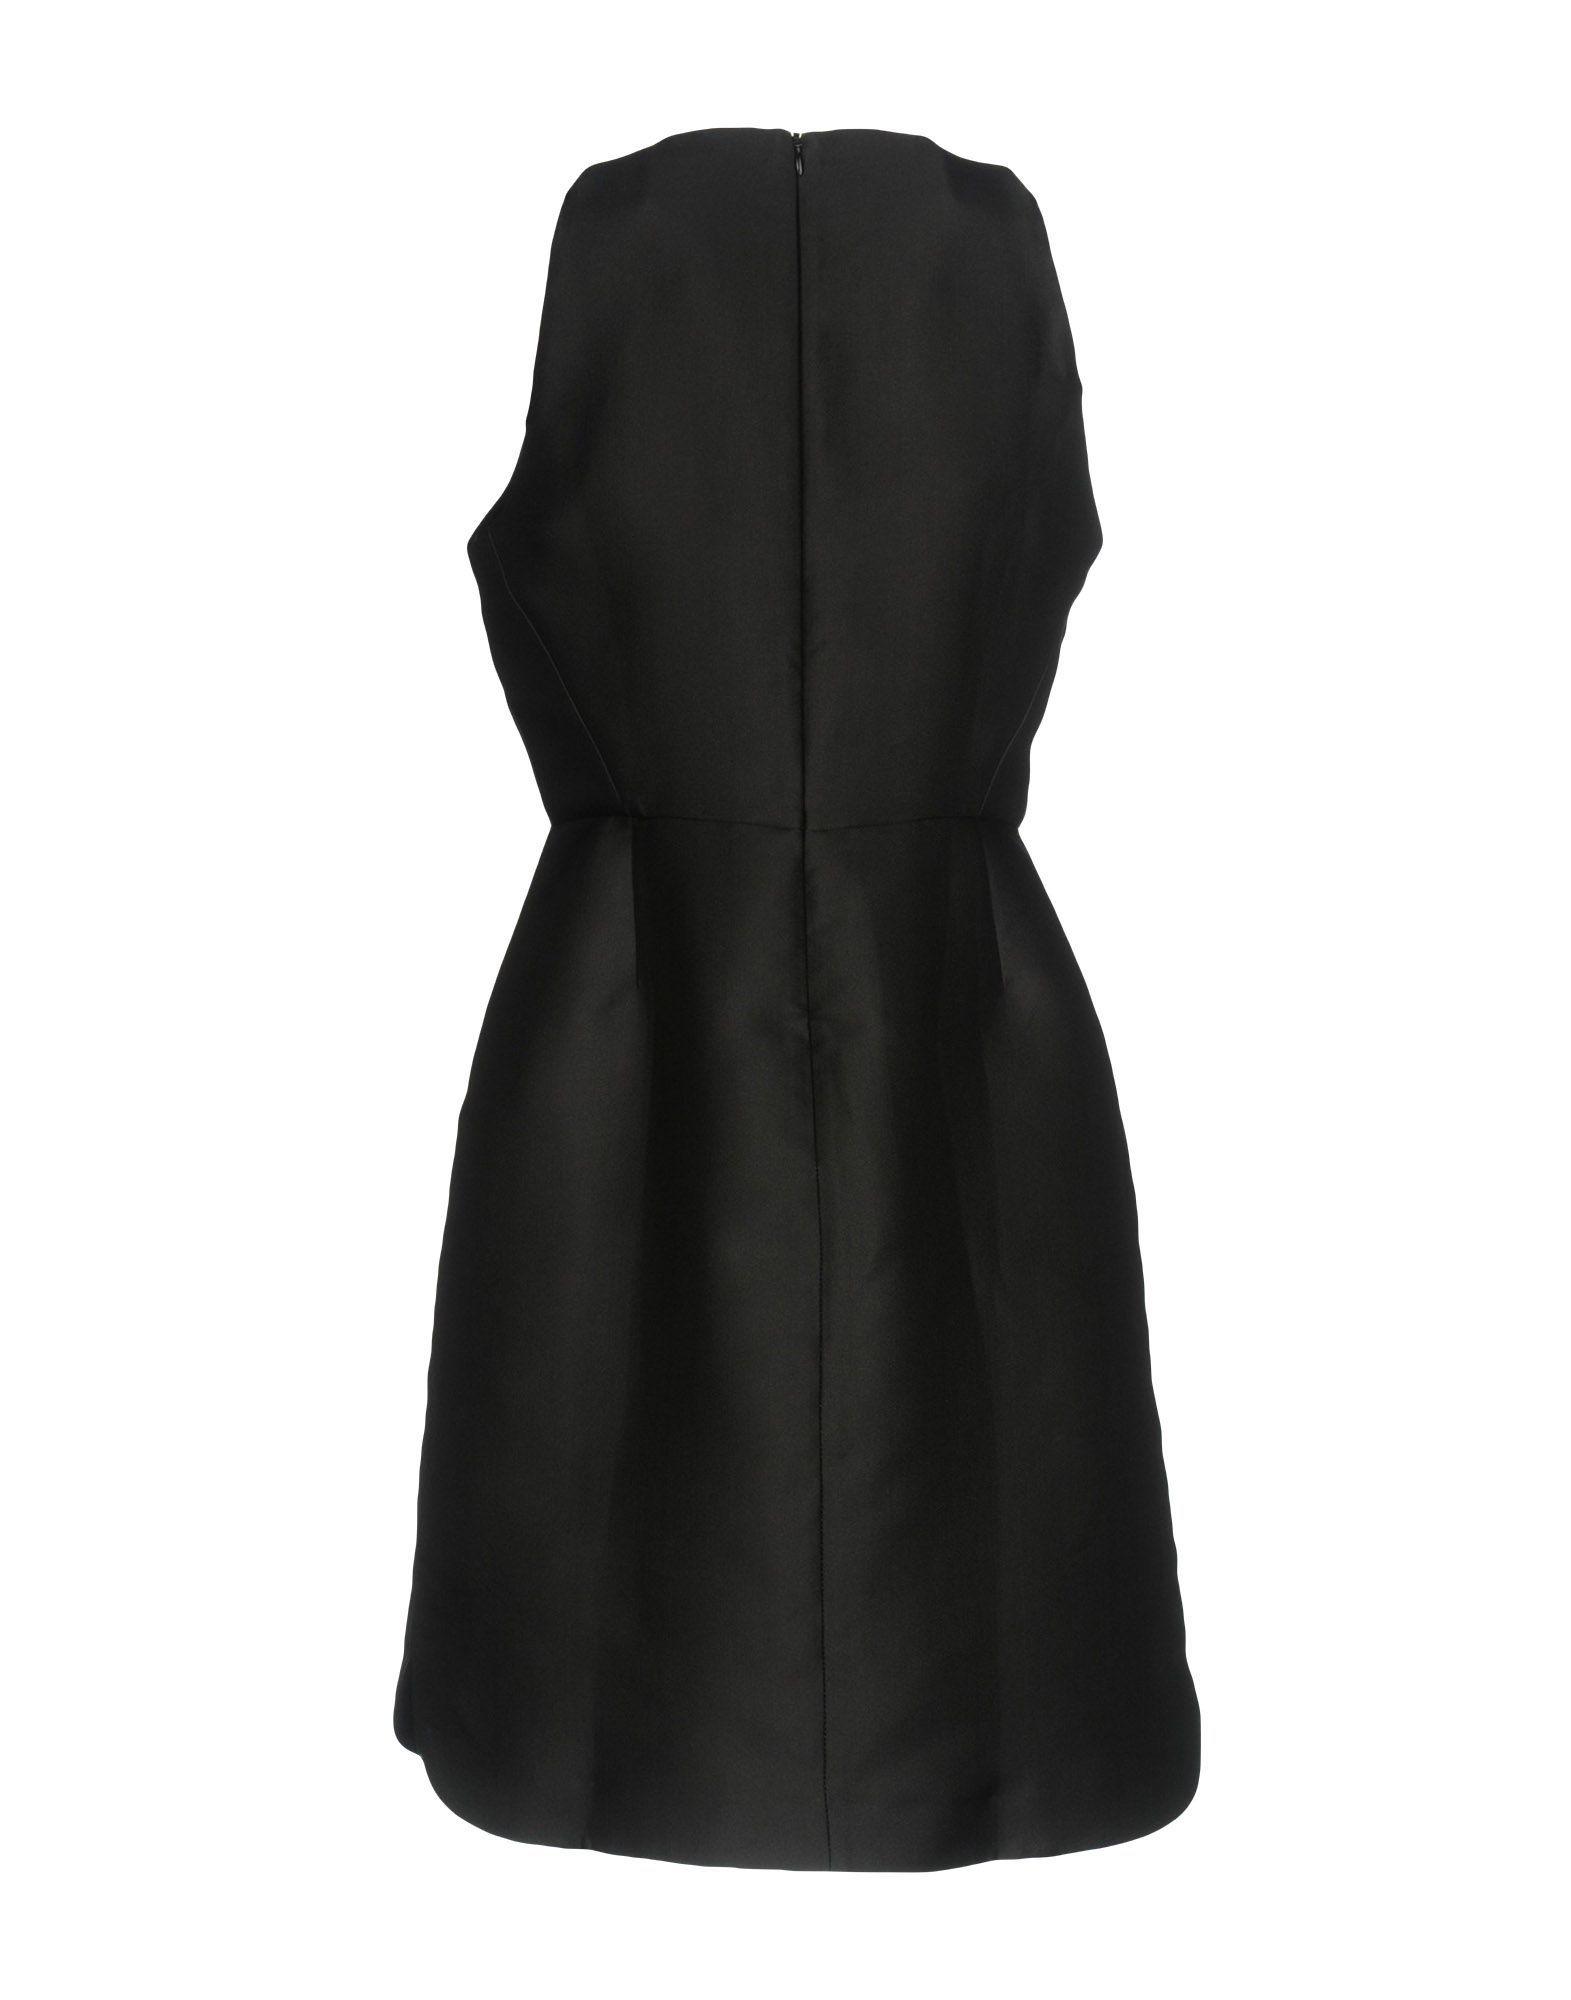 Tara Jarmon Black Satin Embellished Sleeveless Dress